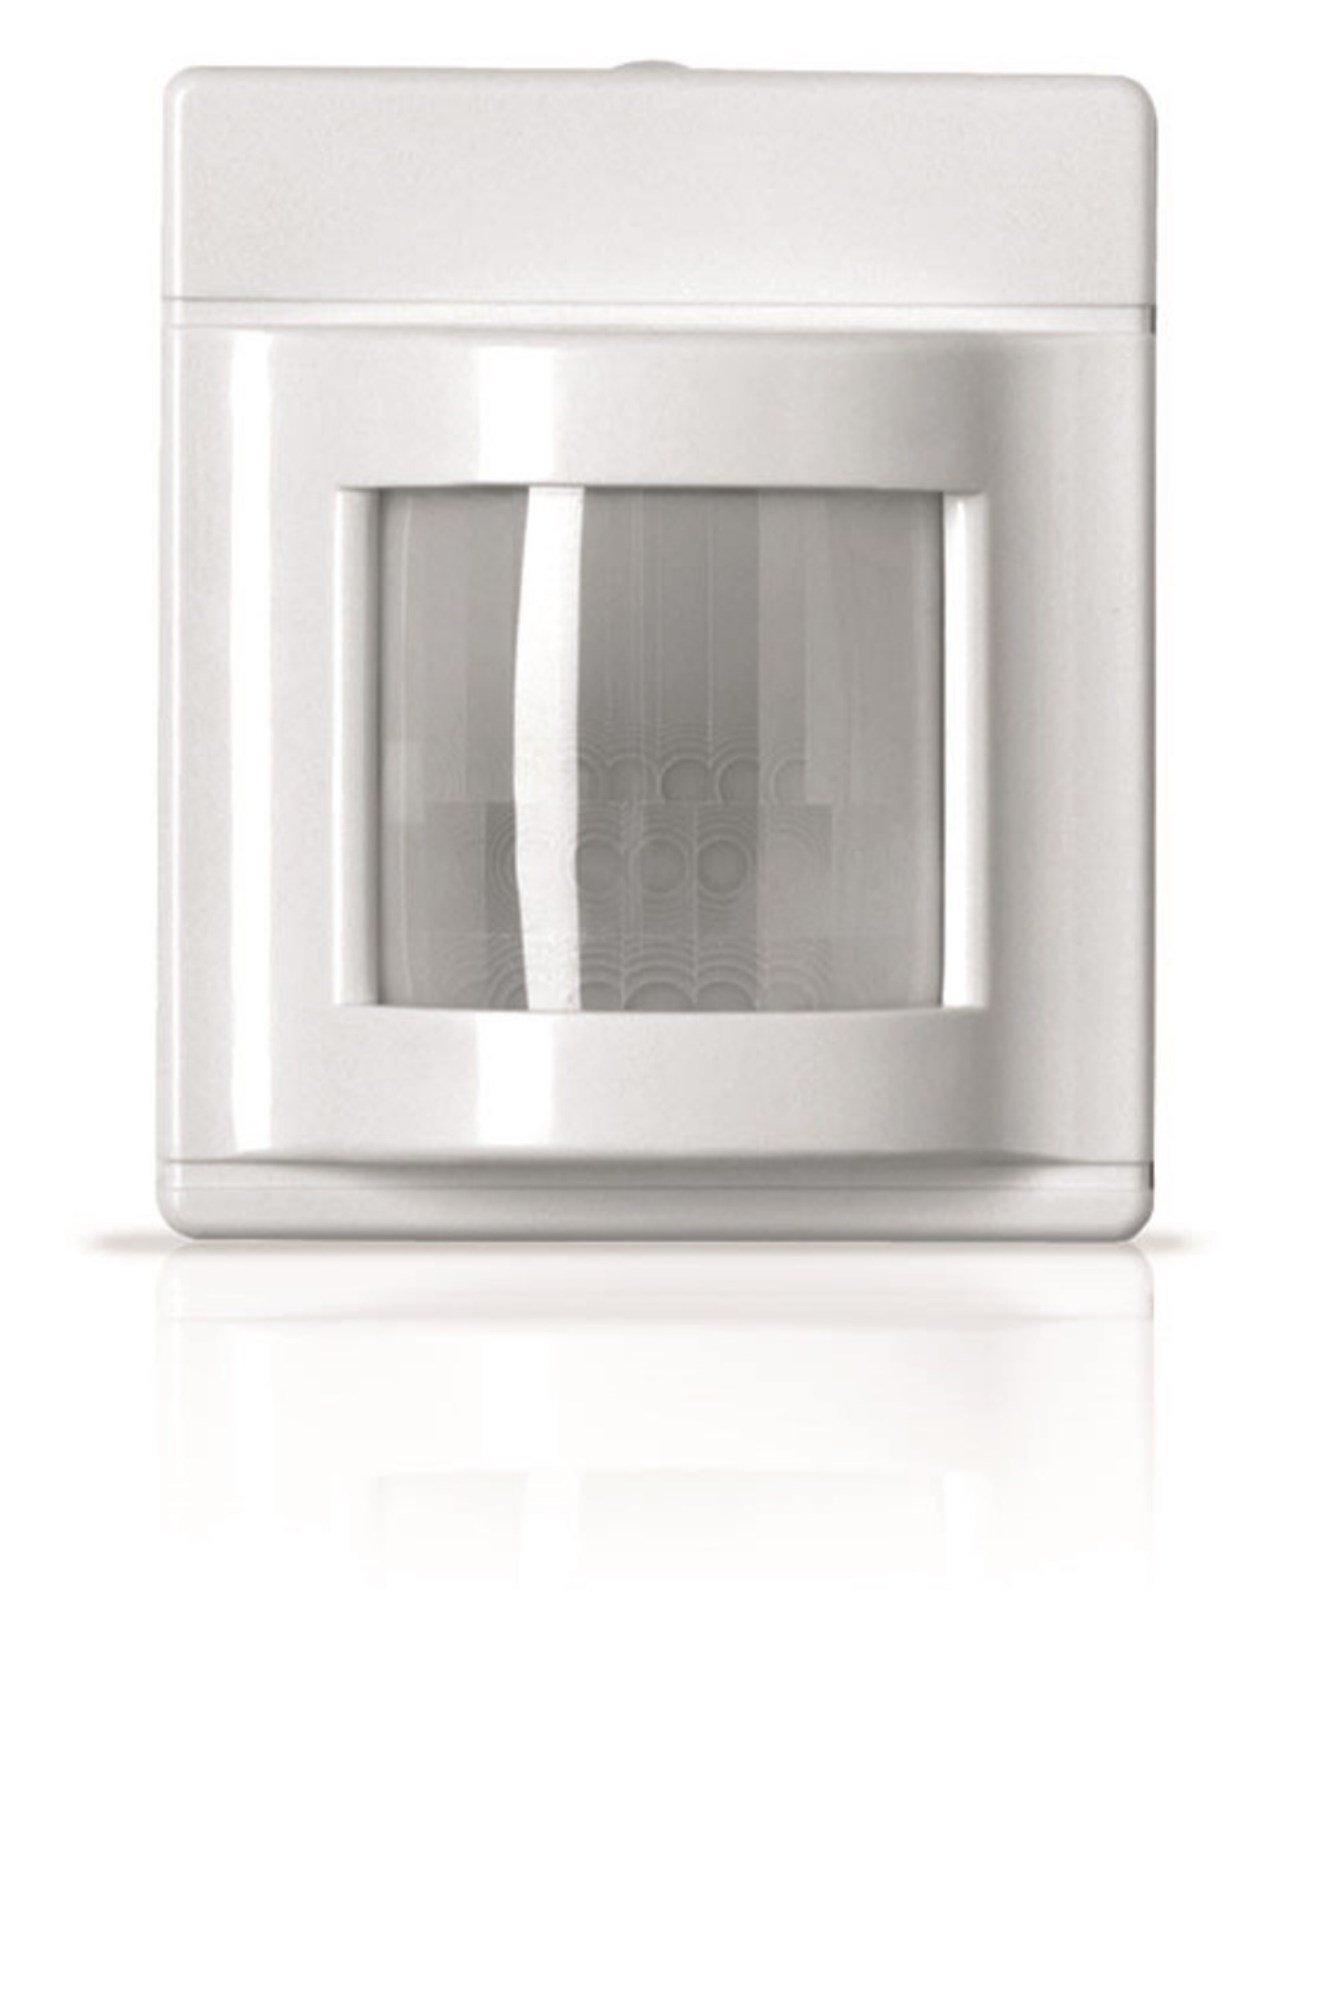 Sensor Switch WV 16 Corner Mount Low Voltage, Passive Infrared (PIR) Wide View Sensor, White